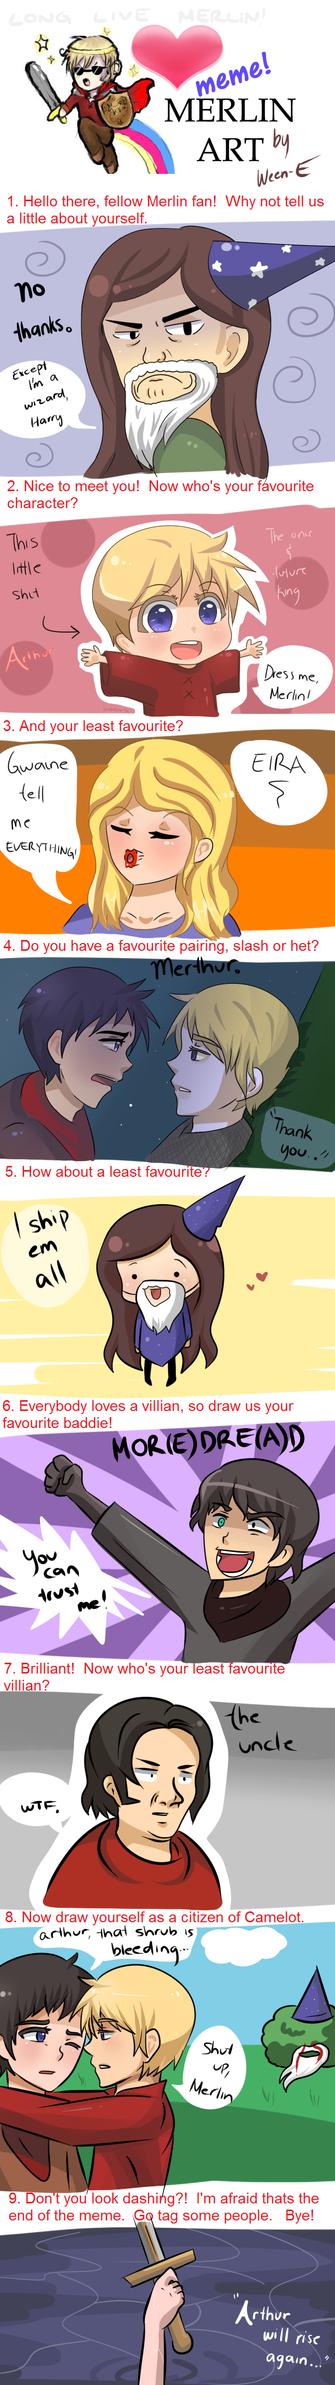 Merlin Meme (SPOILERS) by Ween-E